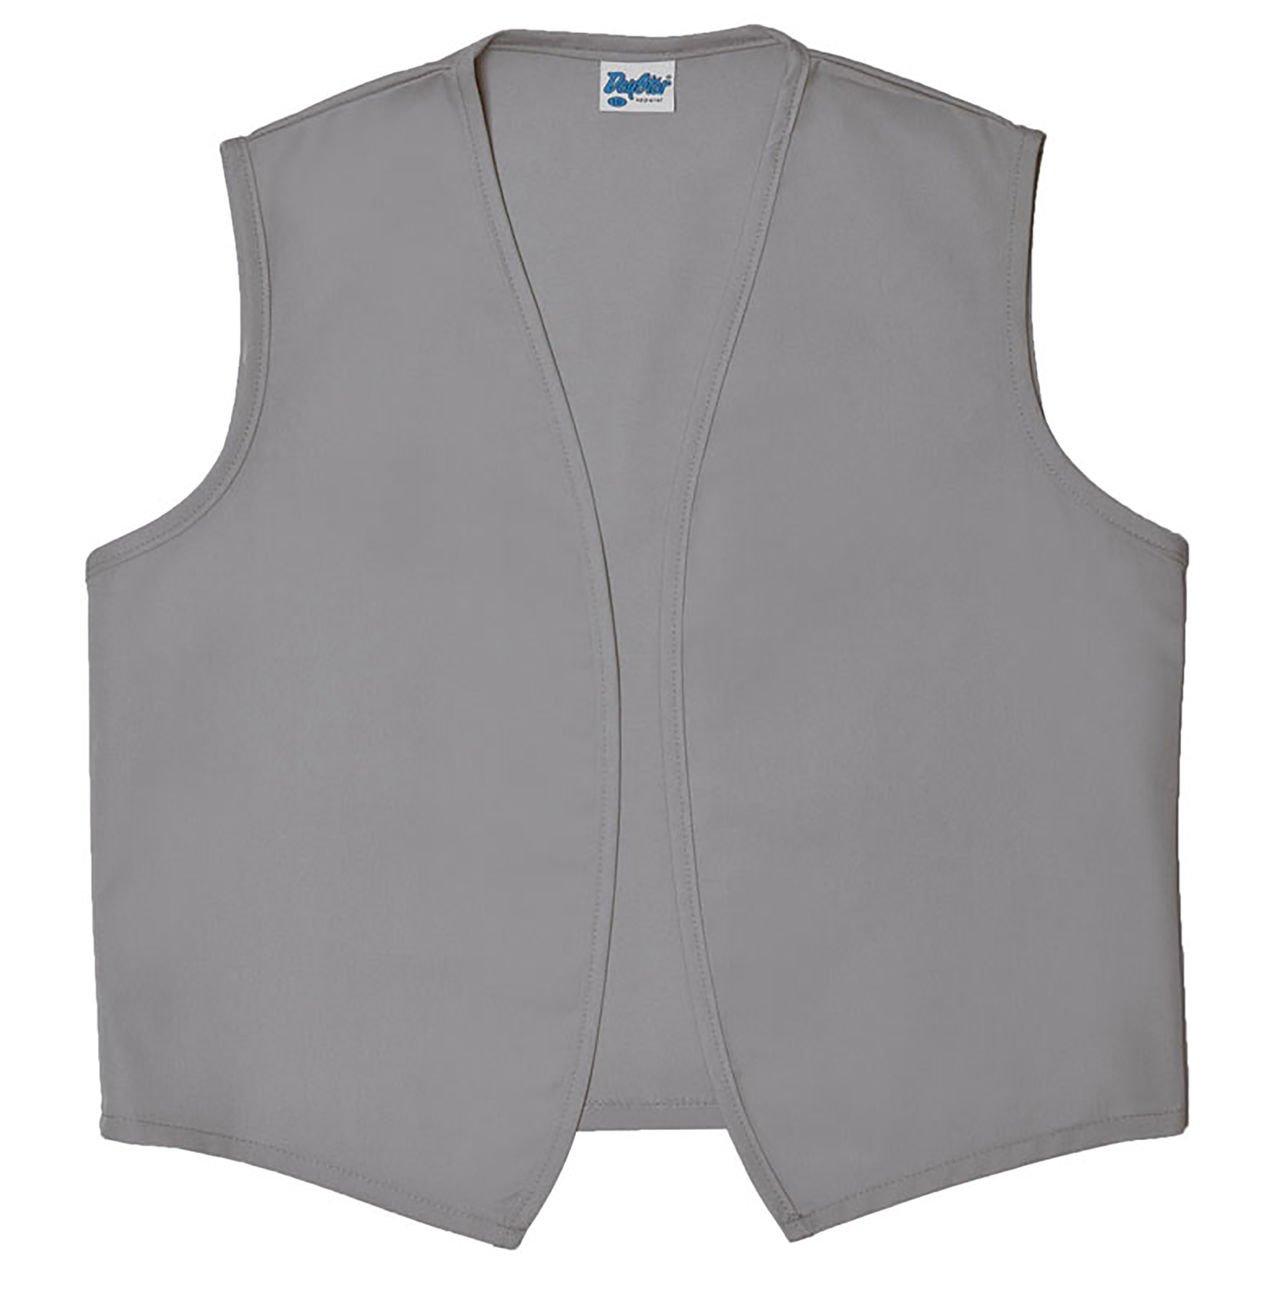 Style A740NP No Pocket Unisex Uniform Vest, (Medium, Silver Gray)